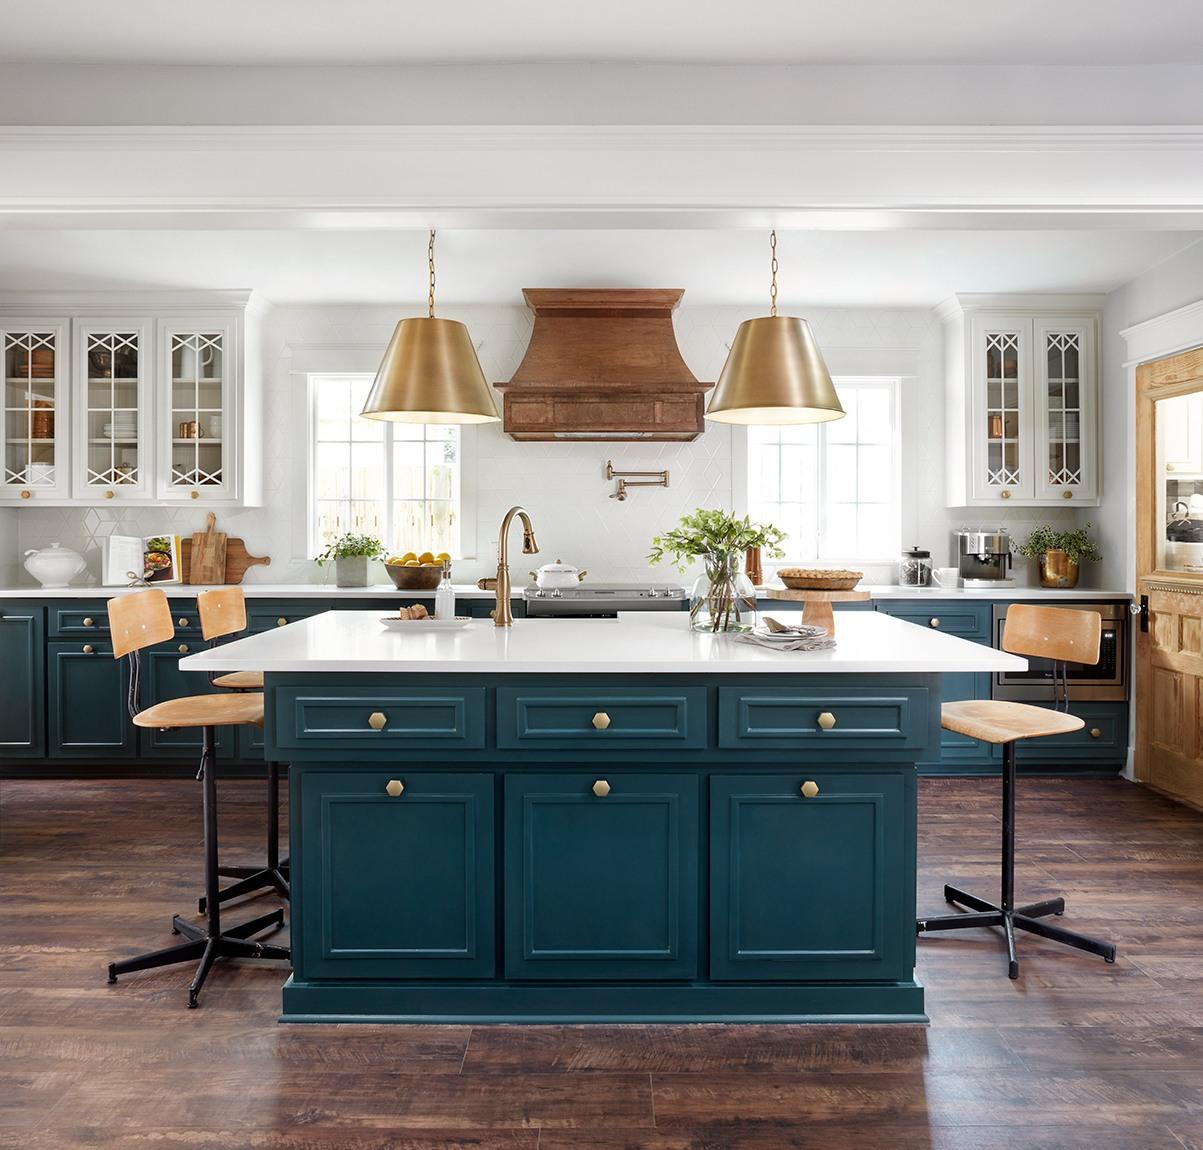 Cuisine Blanche Et Bleu jolies cuisines dans fixer upper (total renovation) - 10